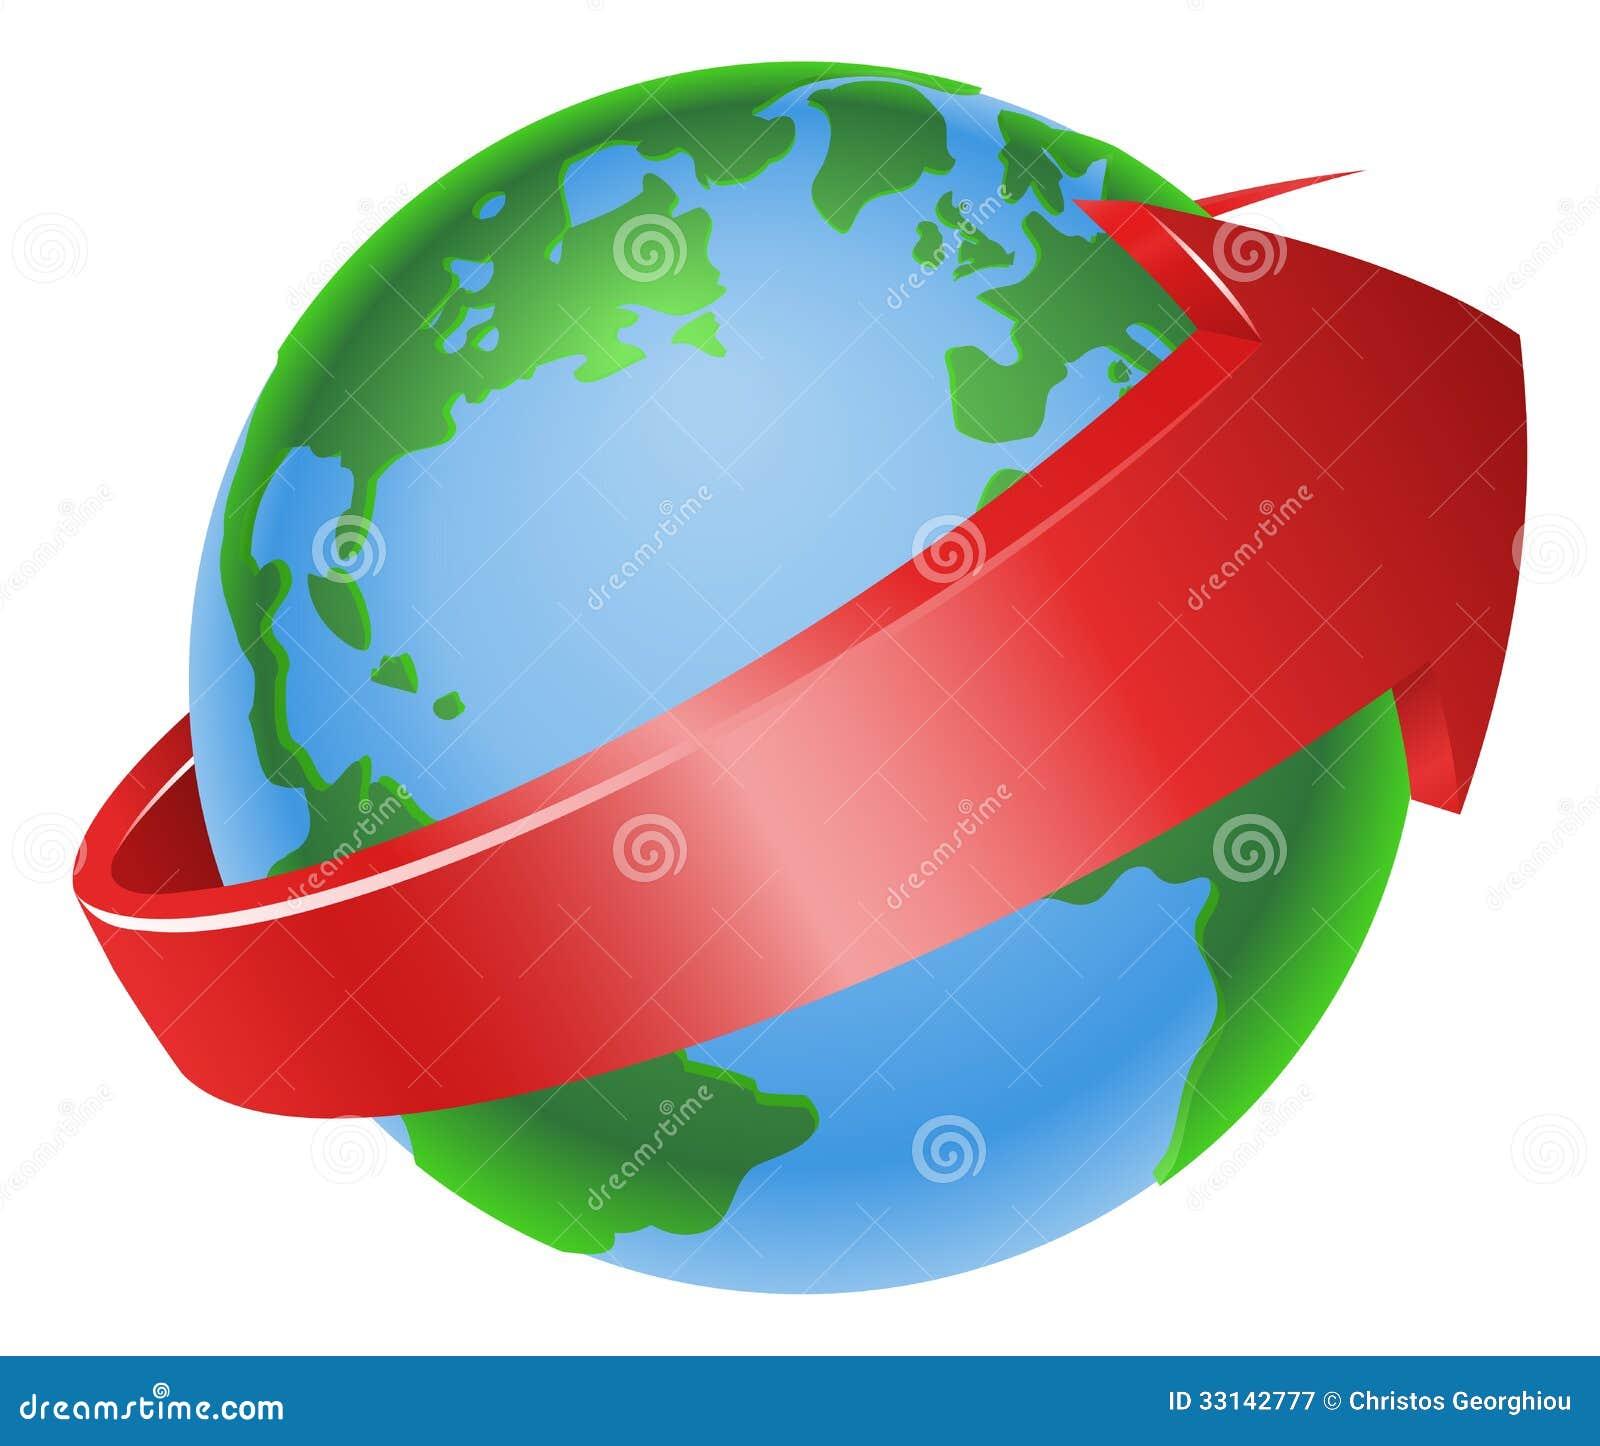 spinning globe clip art animation - photo #29